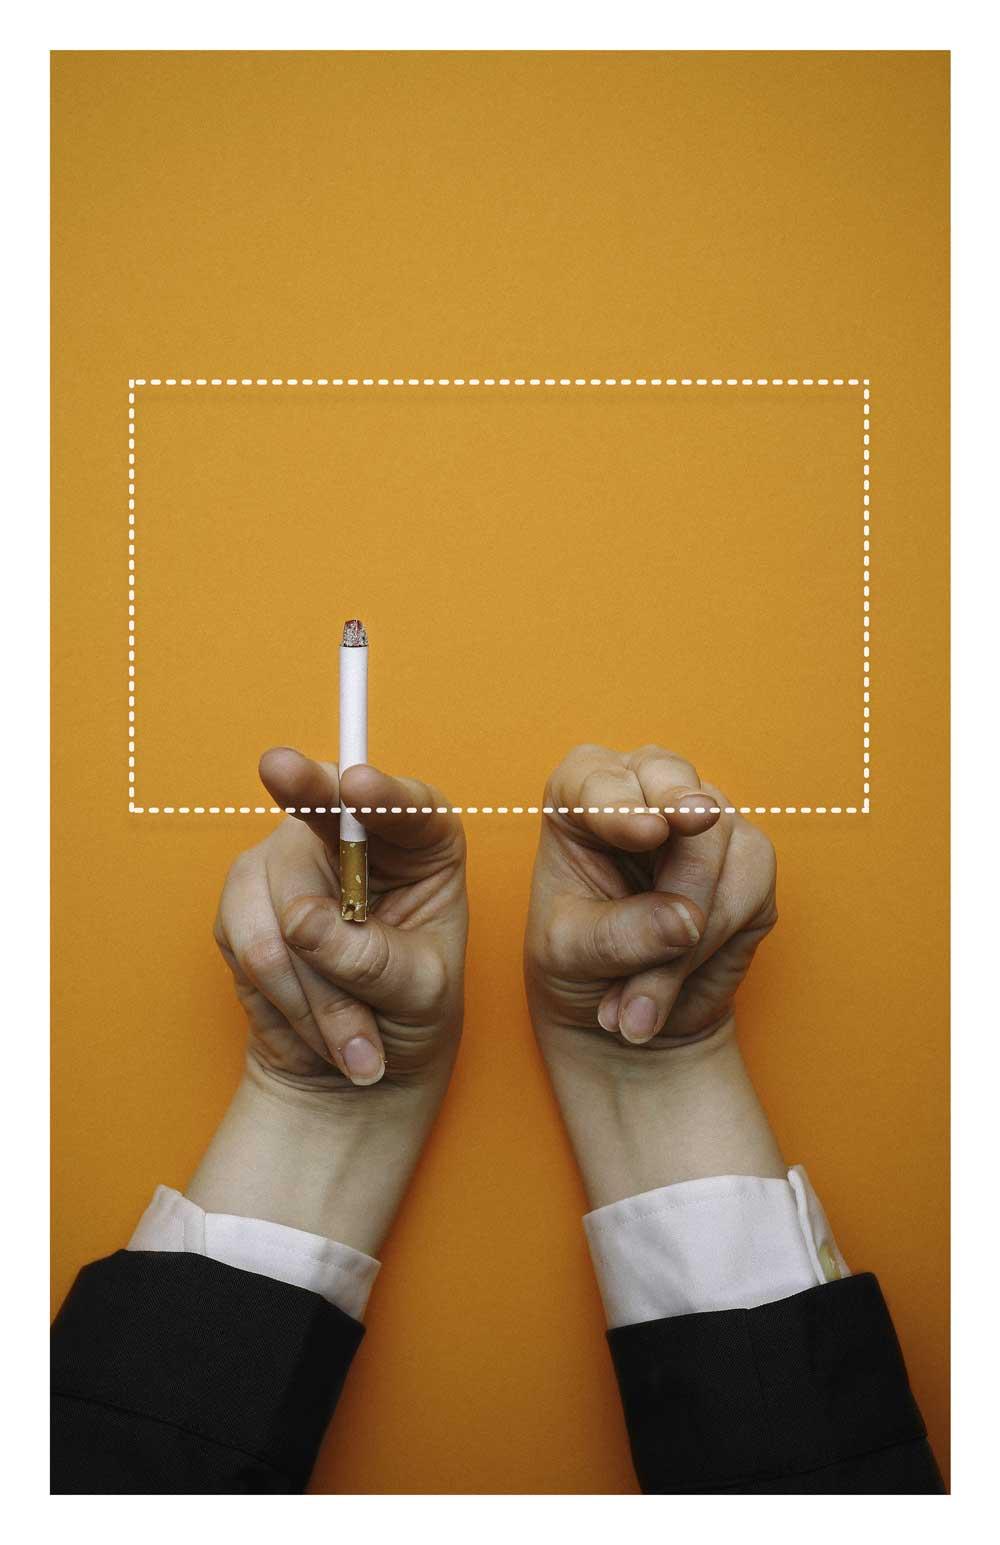 Minimalist Pulp Fiction by Jacob Kuddes and Ben Lundsten